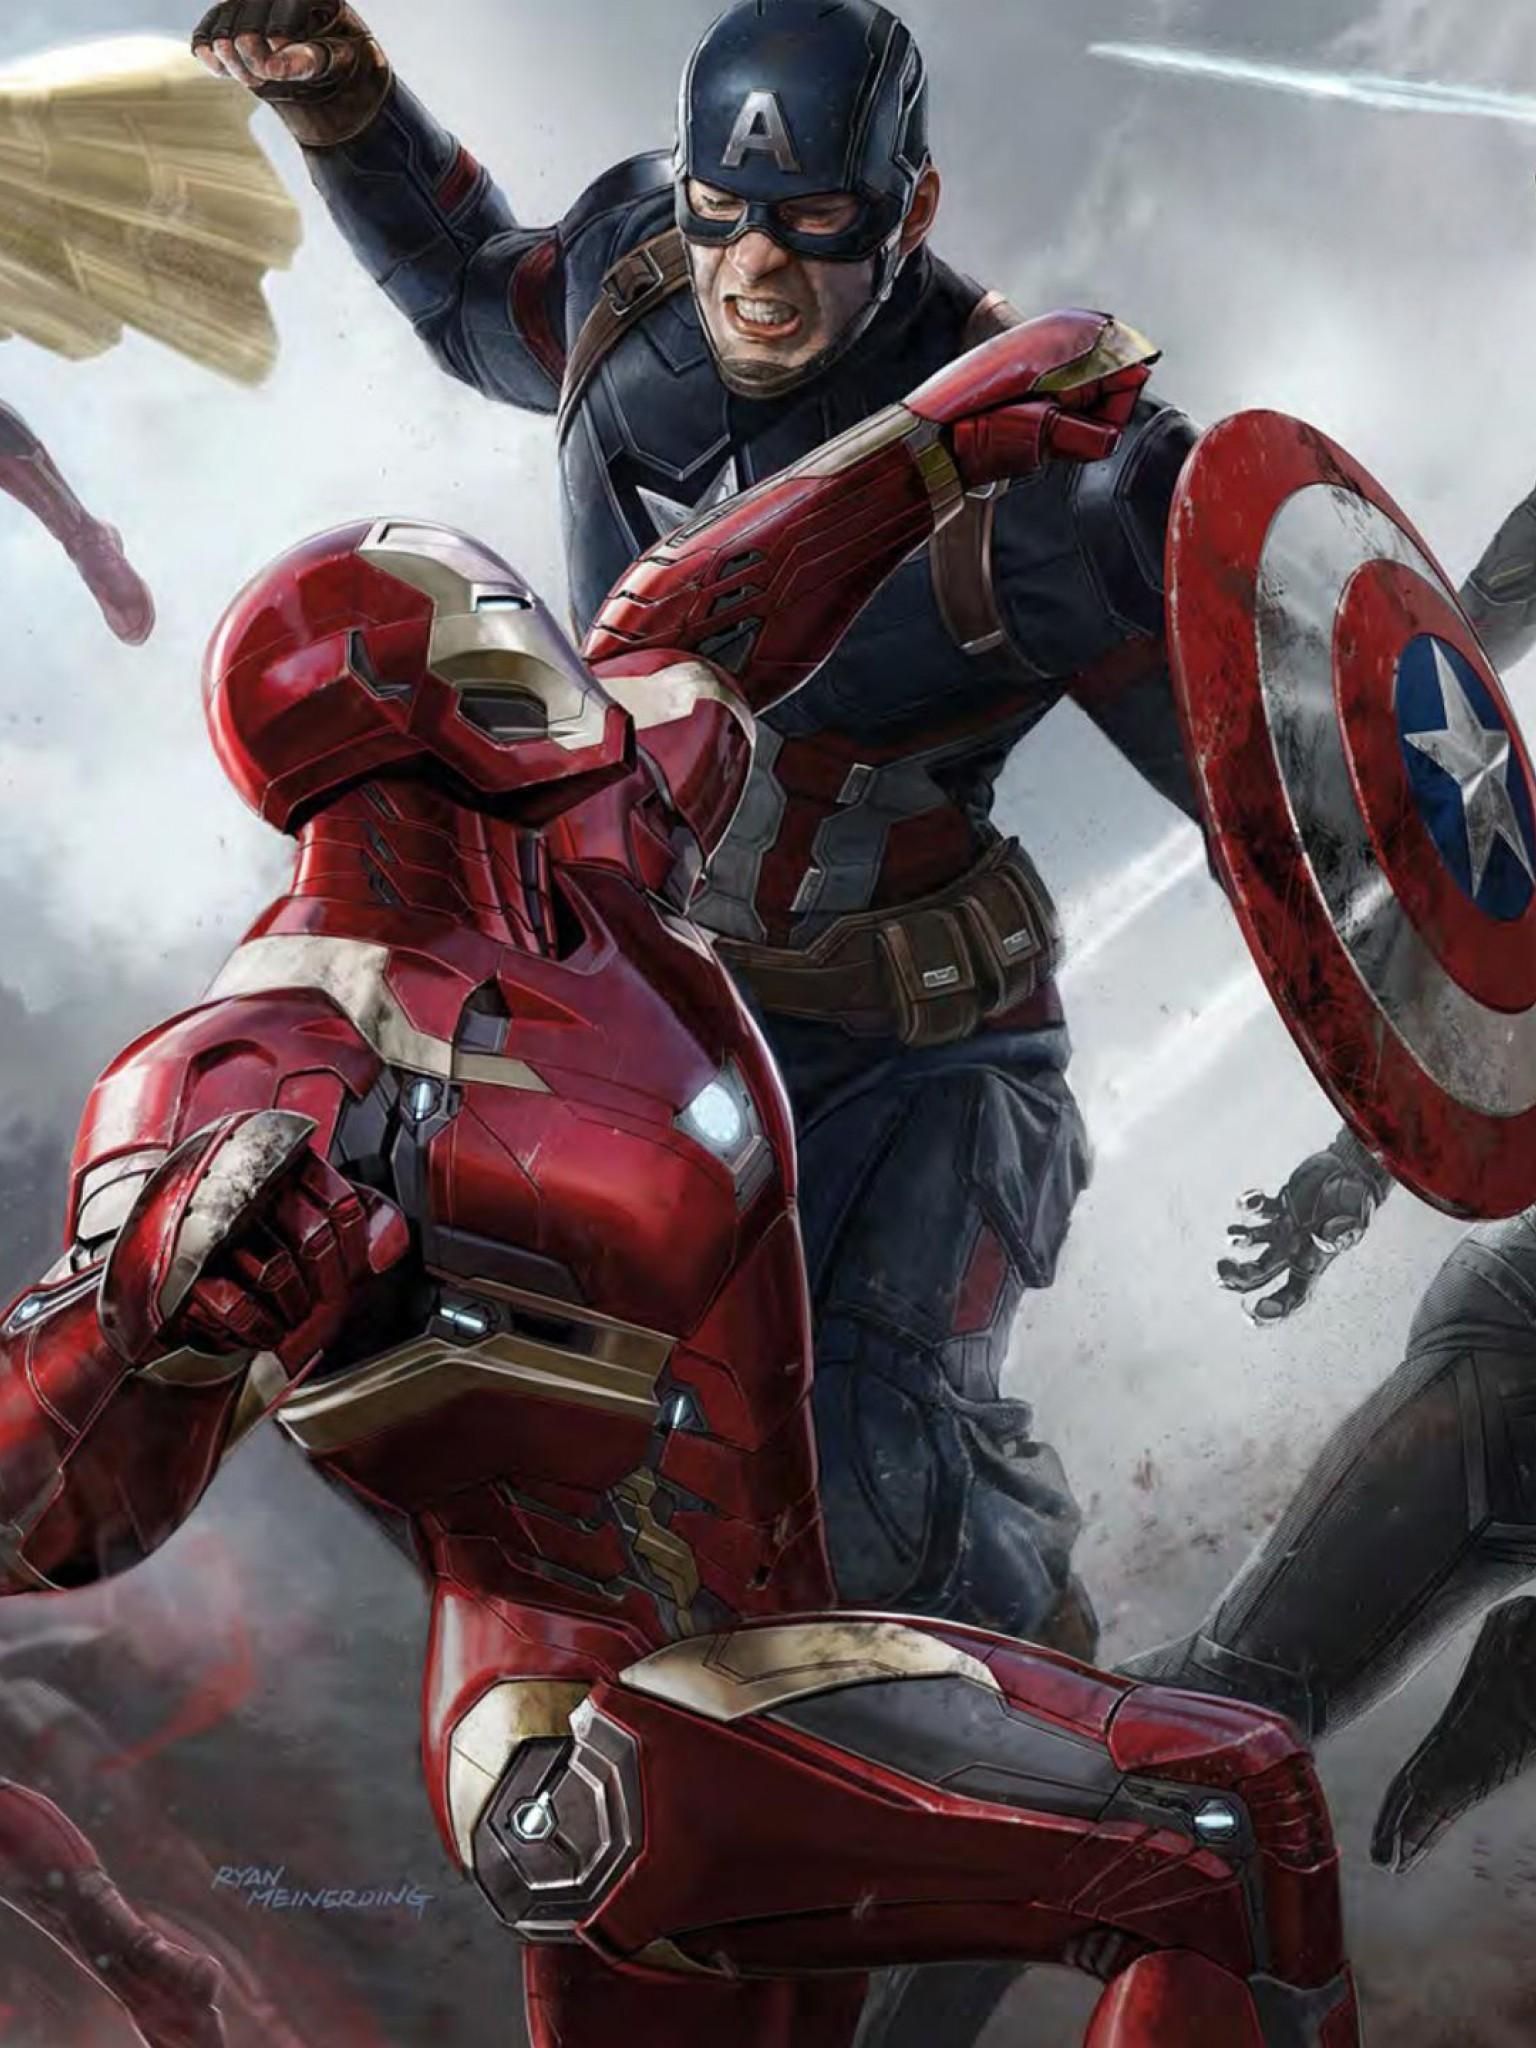 Avengers Civil War Wallpaper (72+ images)